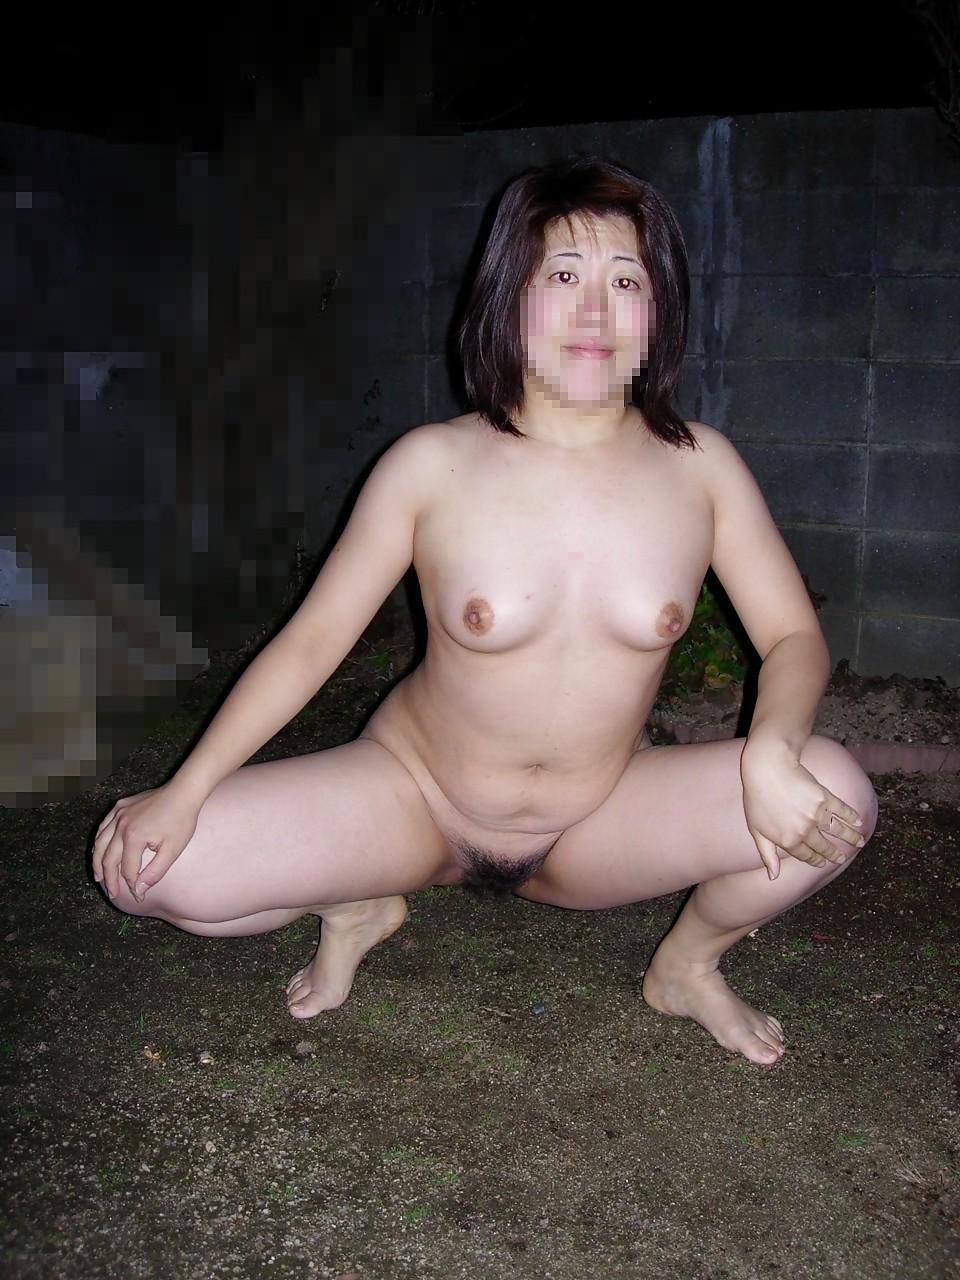 Homemade amateur sex series